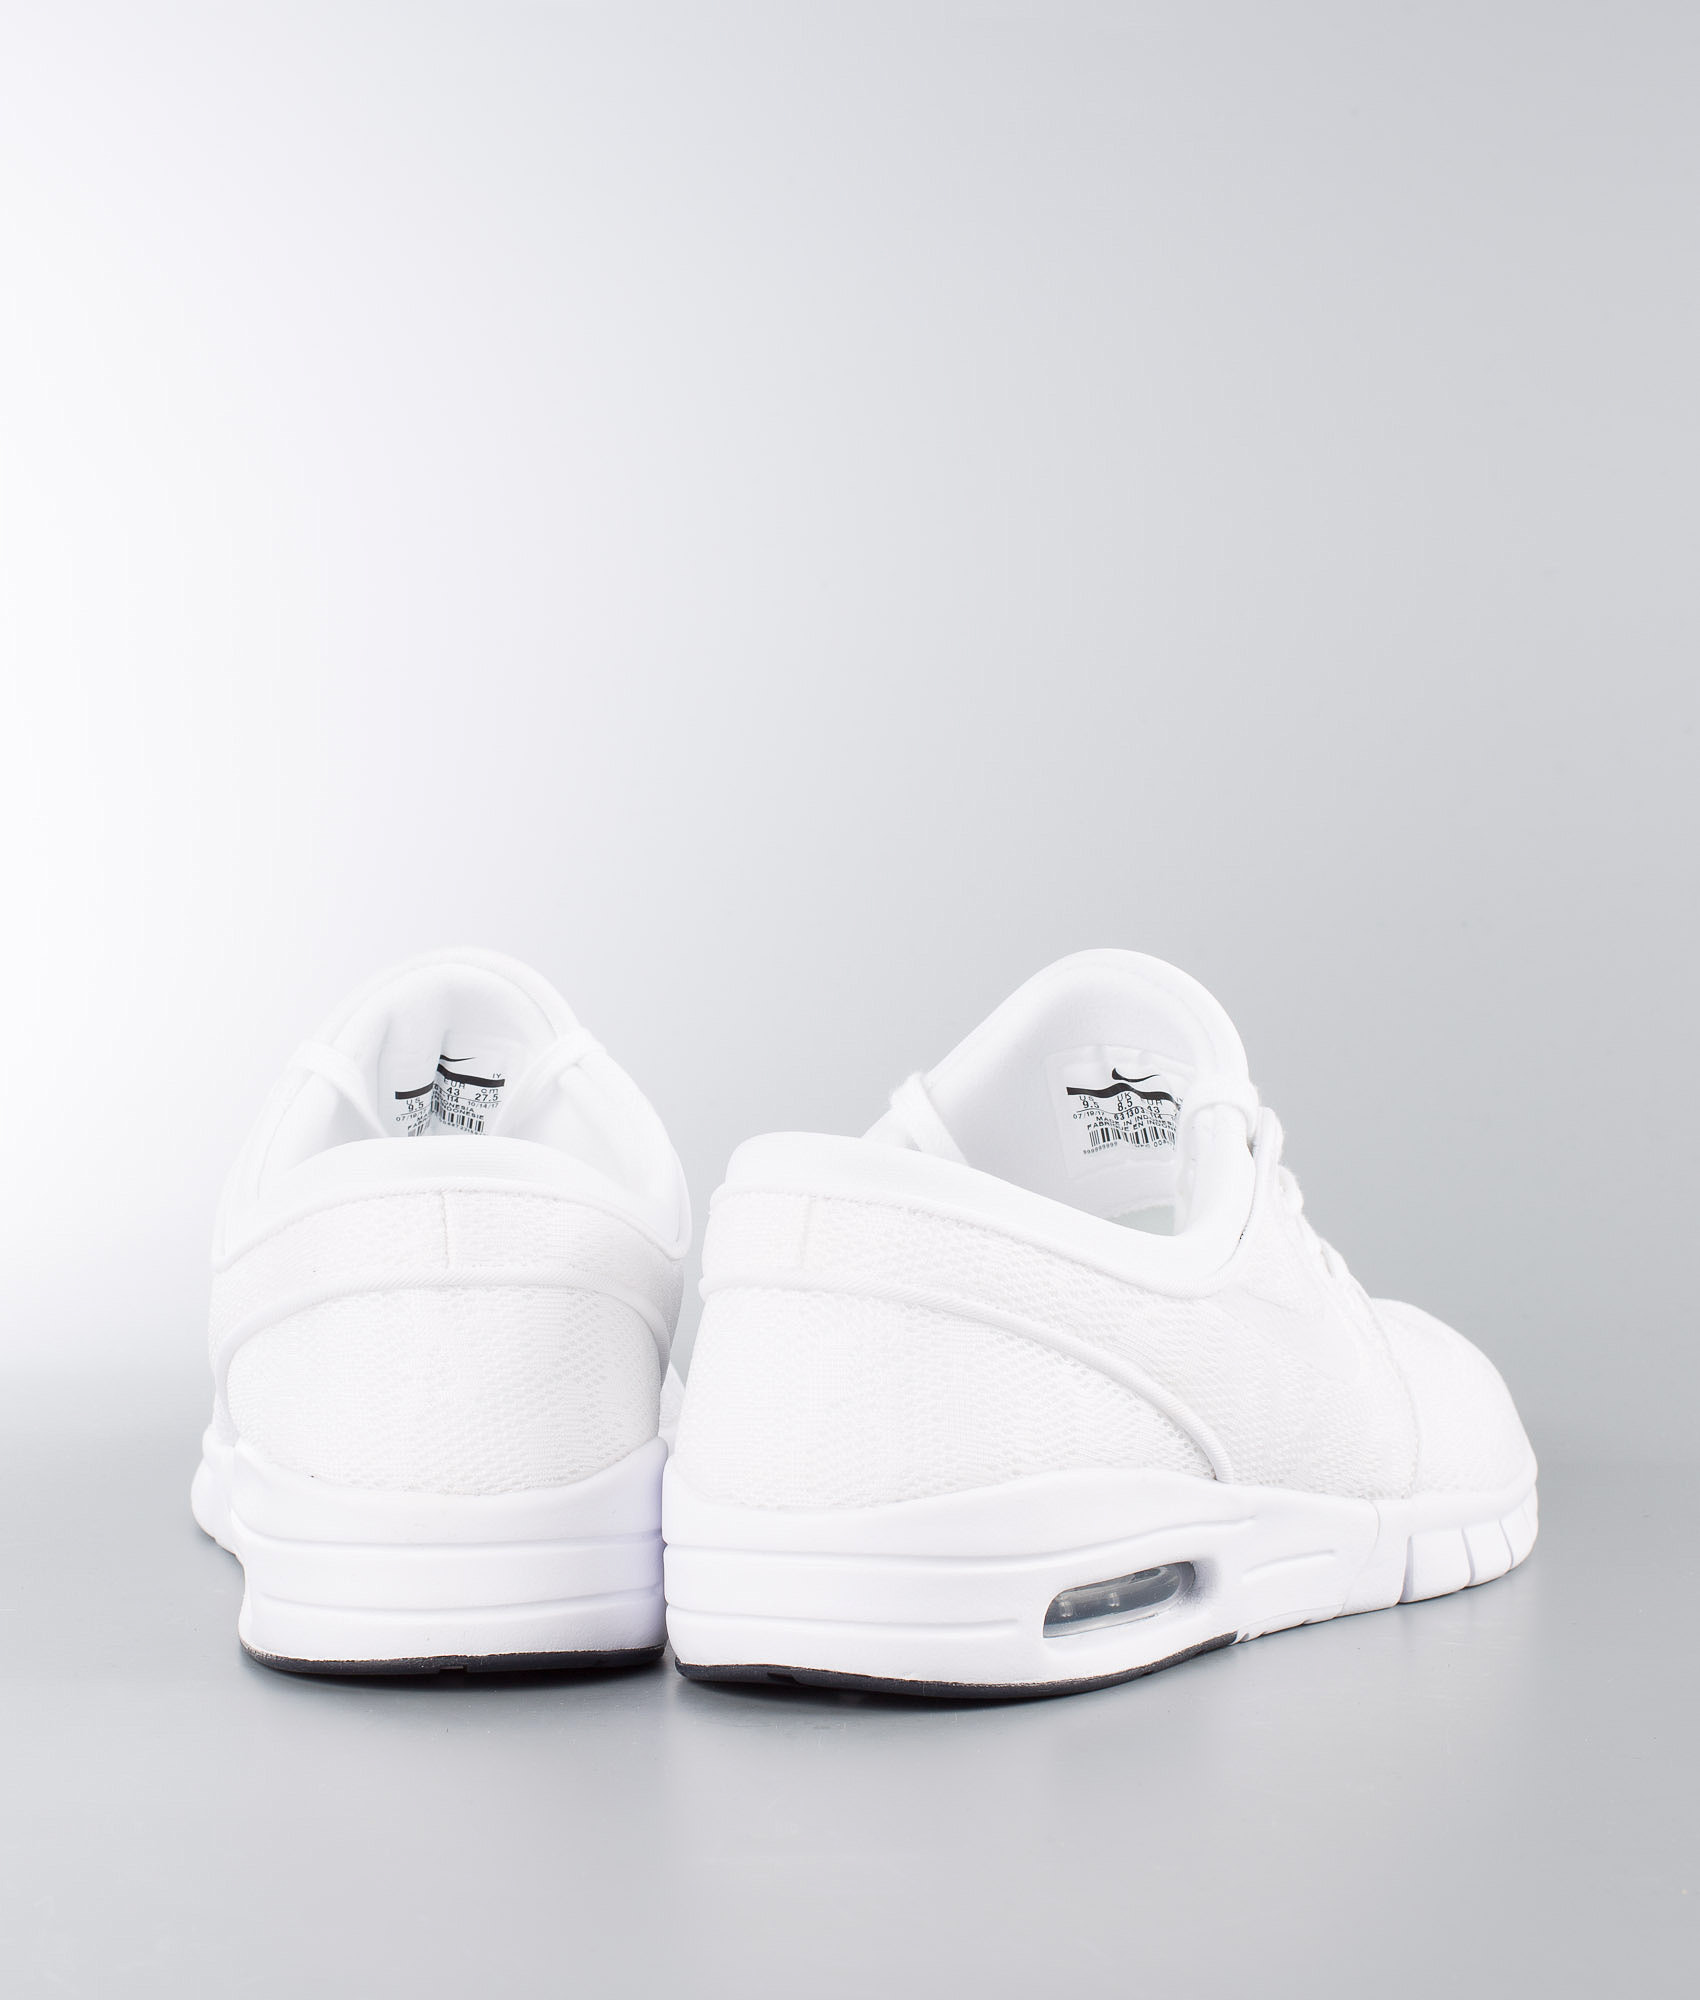 861d8c19d0 Nike Stefan Janoski Max Shoes White/White-Obsidian - Ridestore.com